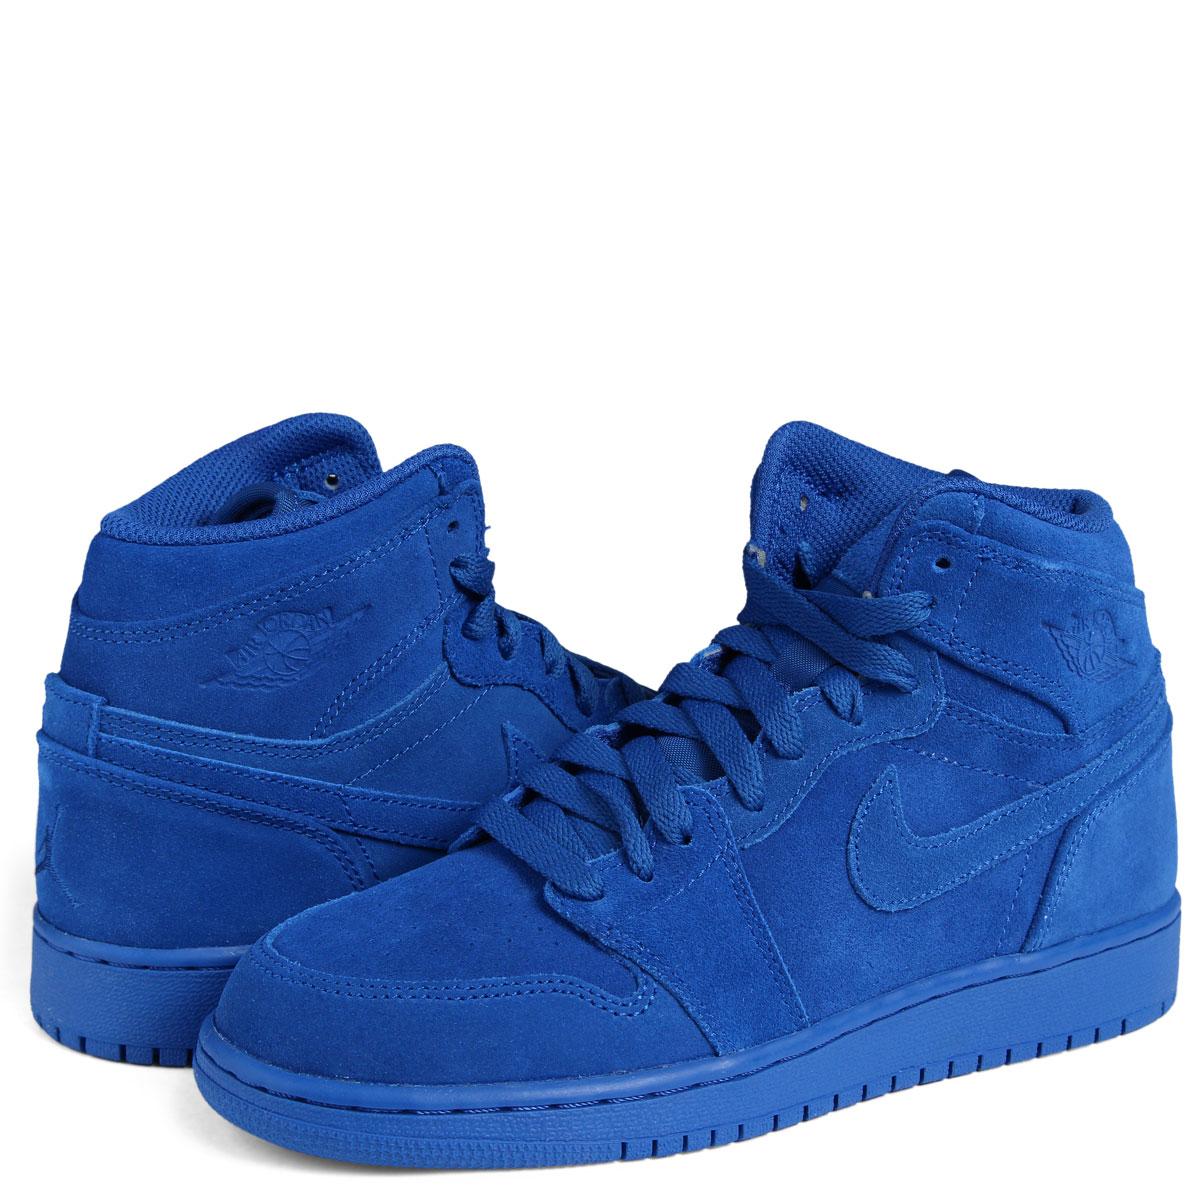 618eba13b553 Whats up Sports  NIKE AIR JORDAN 1 RETRO BG Nike Air Jordan 1 ...